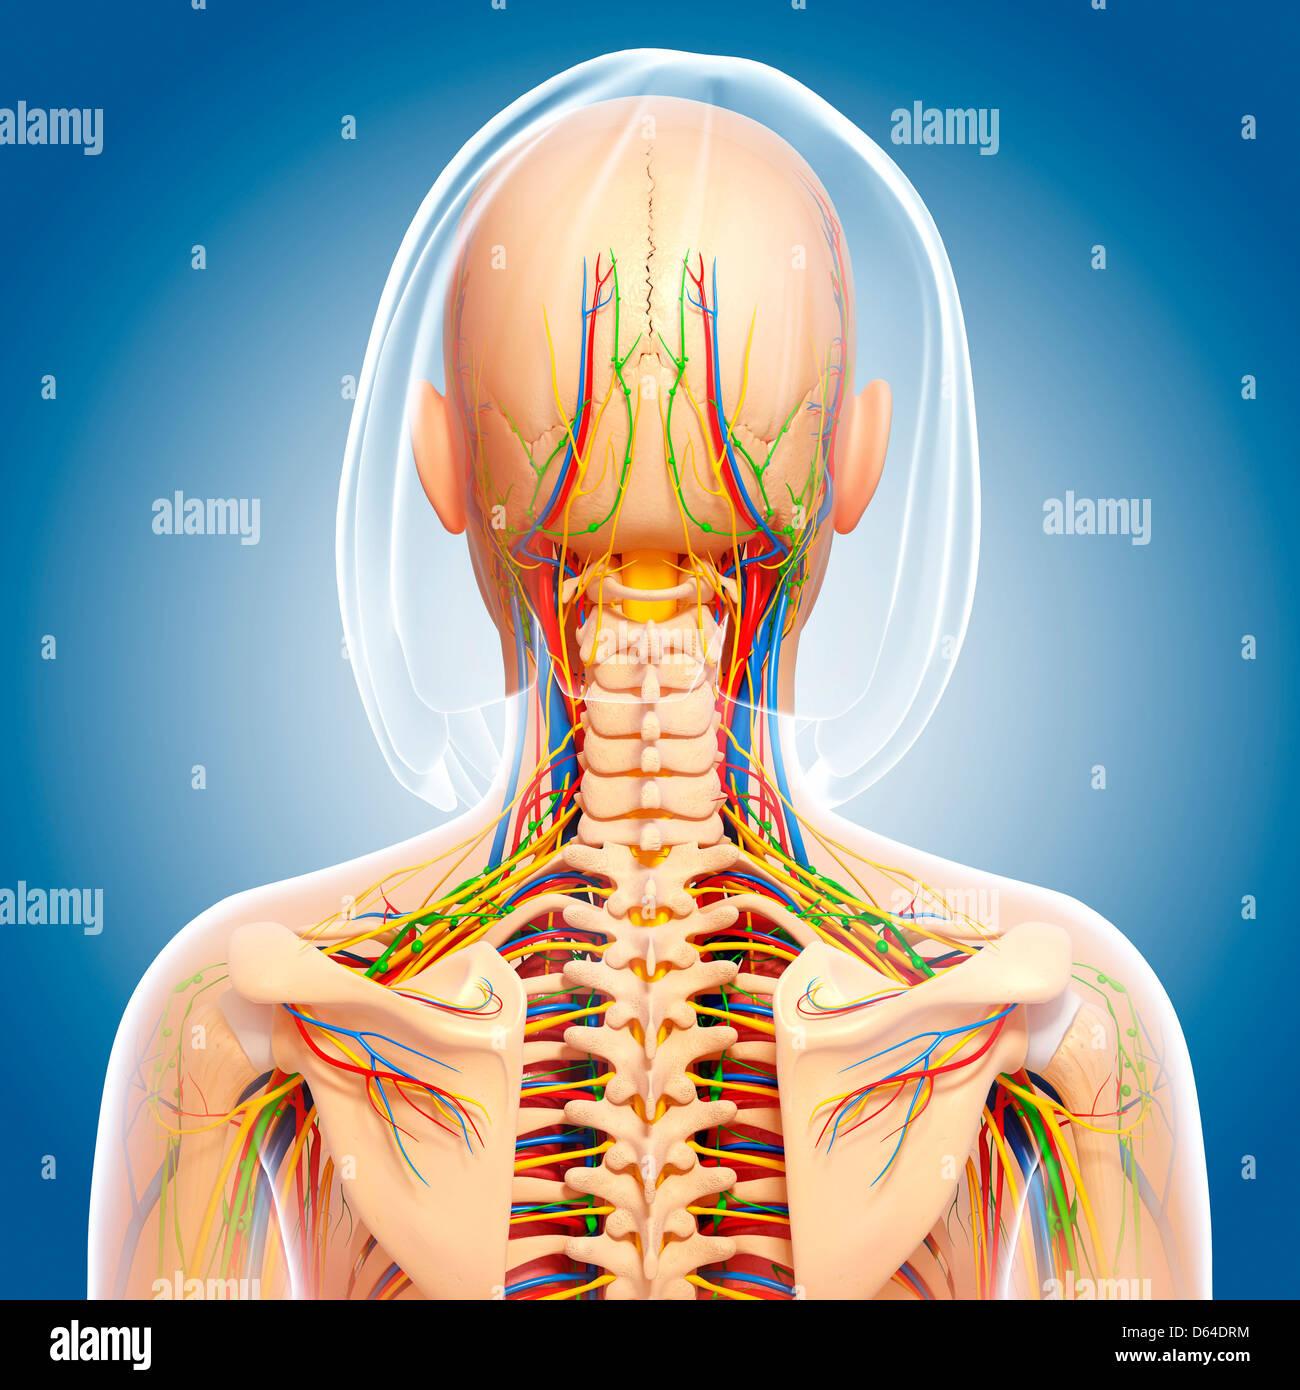 Oberkörper-Anatomie, artwork Stockfoto, Bild: 55417704 - Alamy